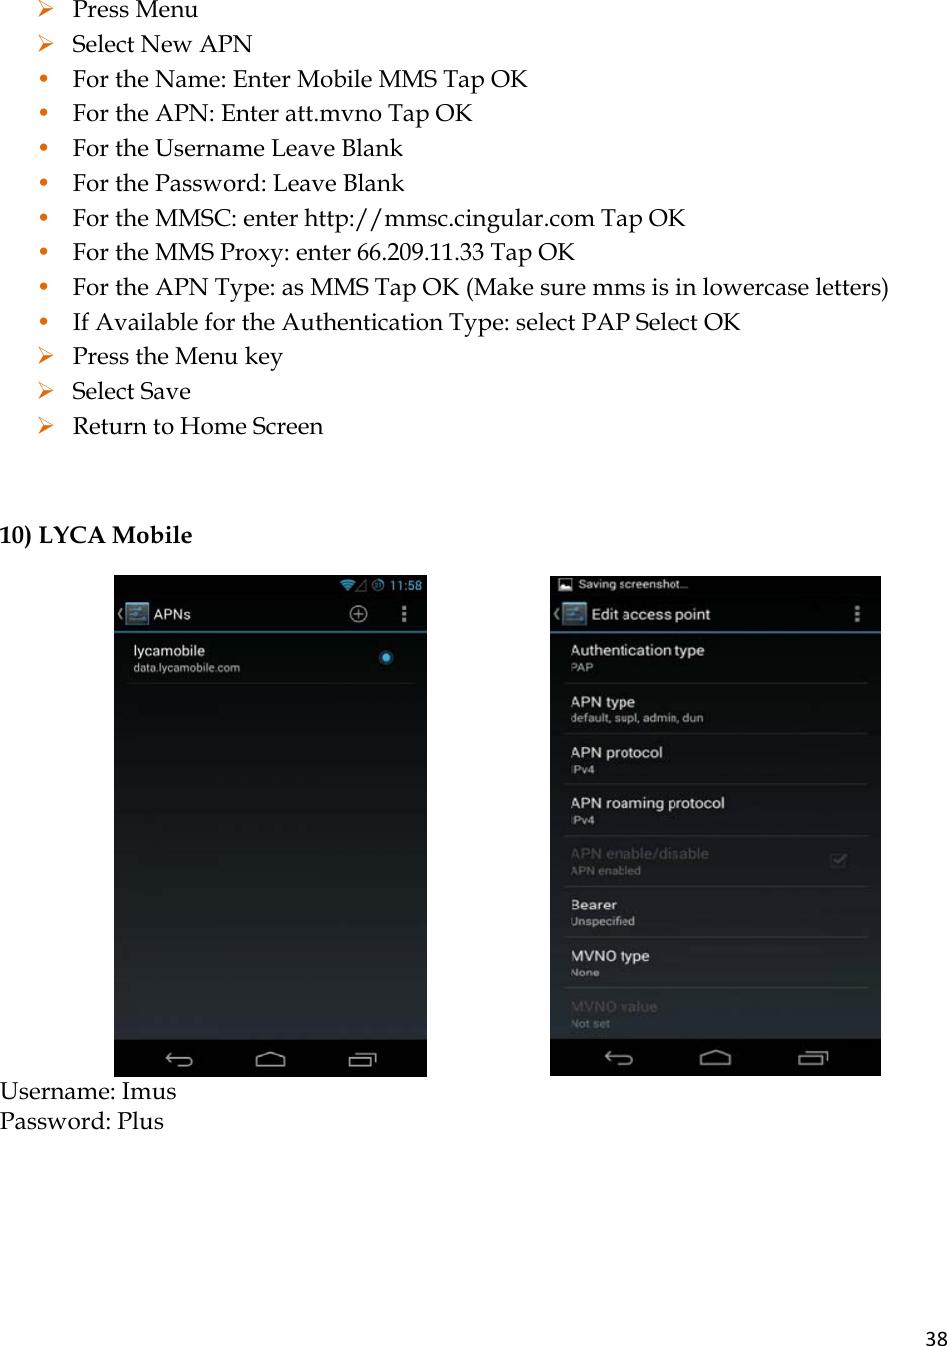 iDROID A5 Mobile phone User Manual User Manual